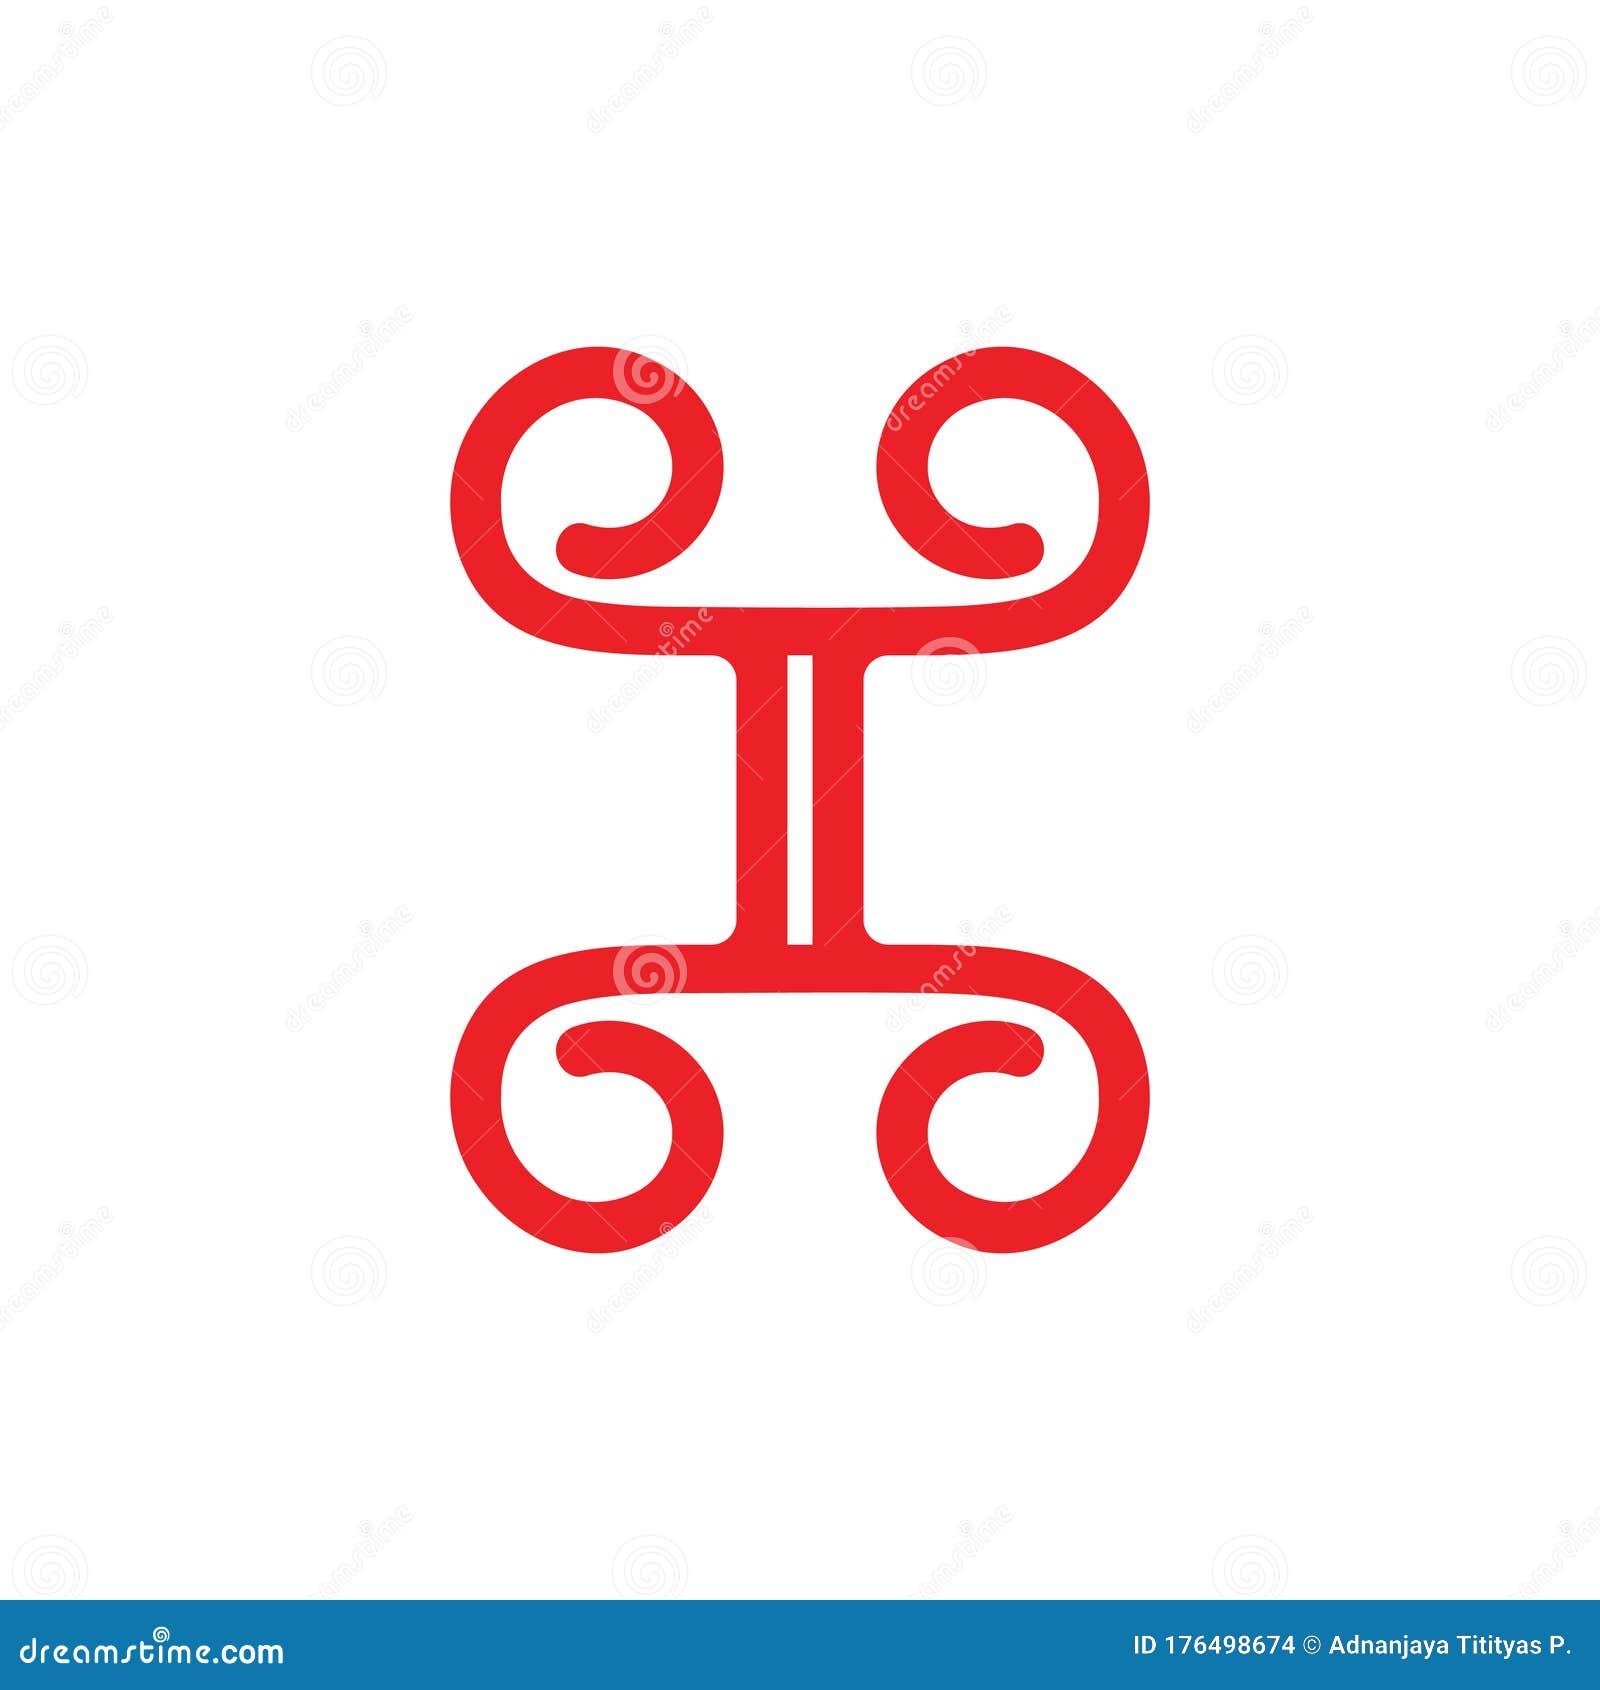 Number Two Curves Spiral Design Symbol Vector Stock